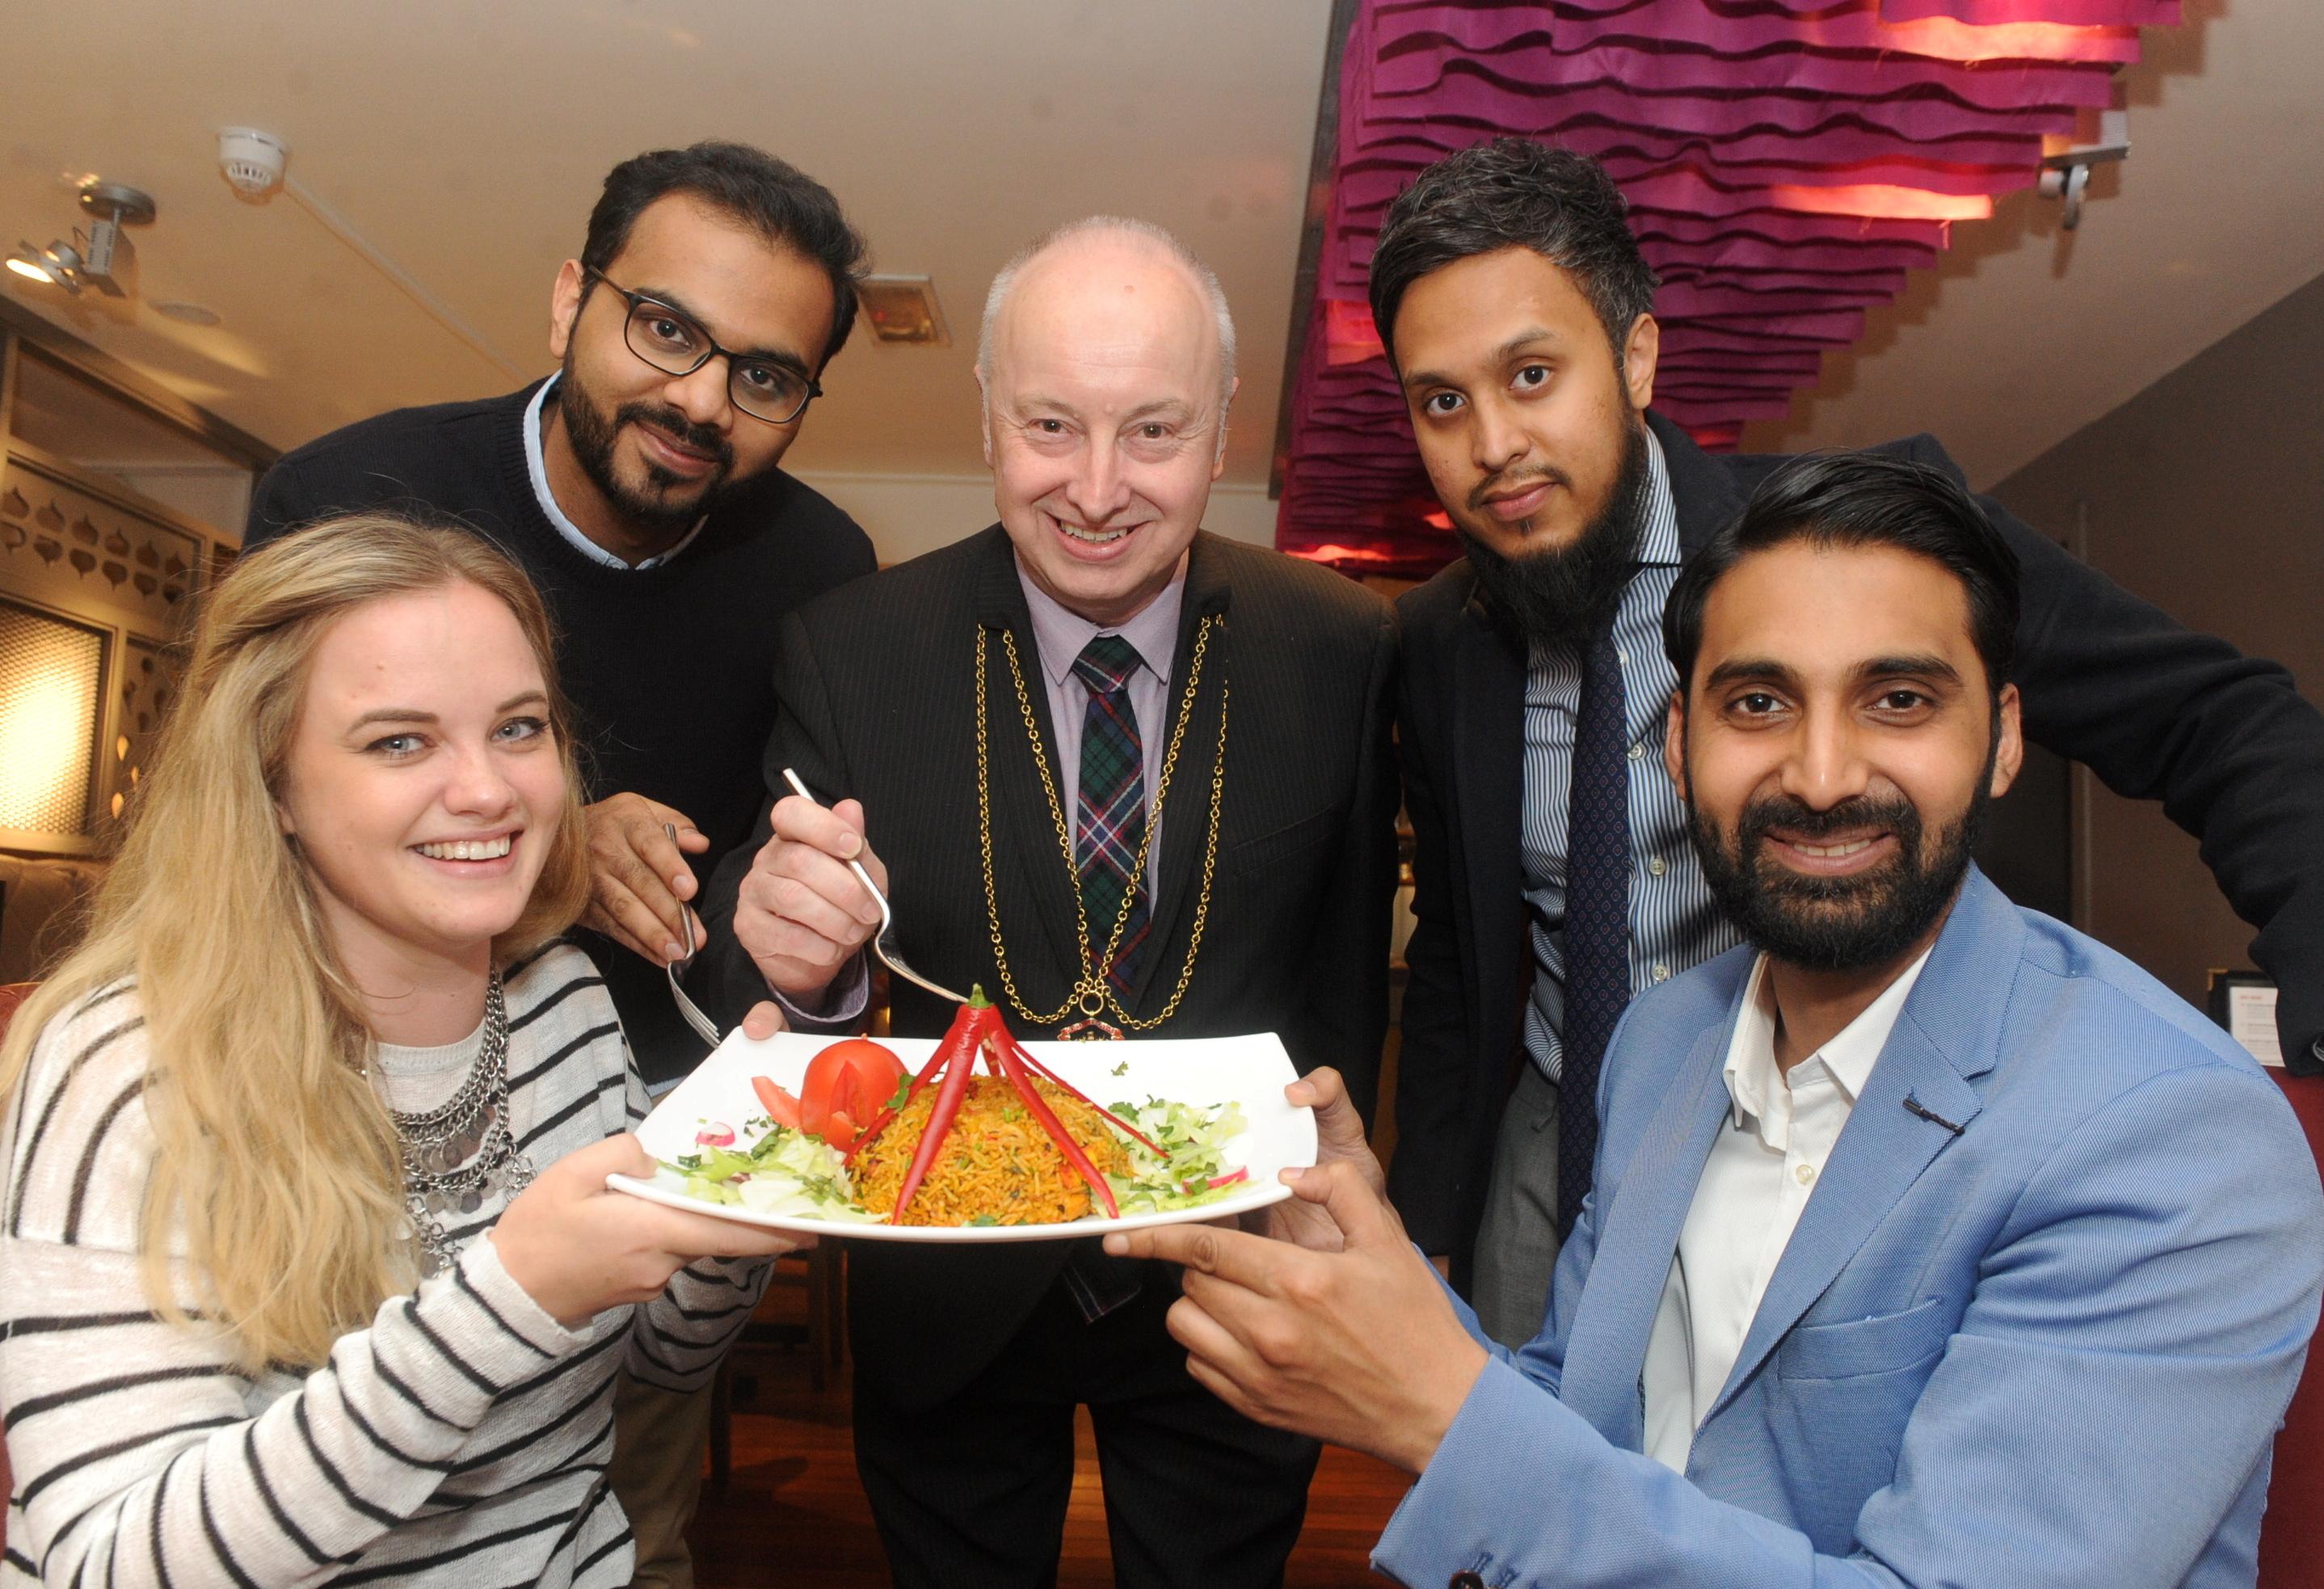 From left, Kimberley Strachan, Sameer Siddiqui, Lord Provost George Adam, Maaruf Razzak and Sumon Hoque.